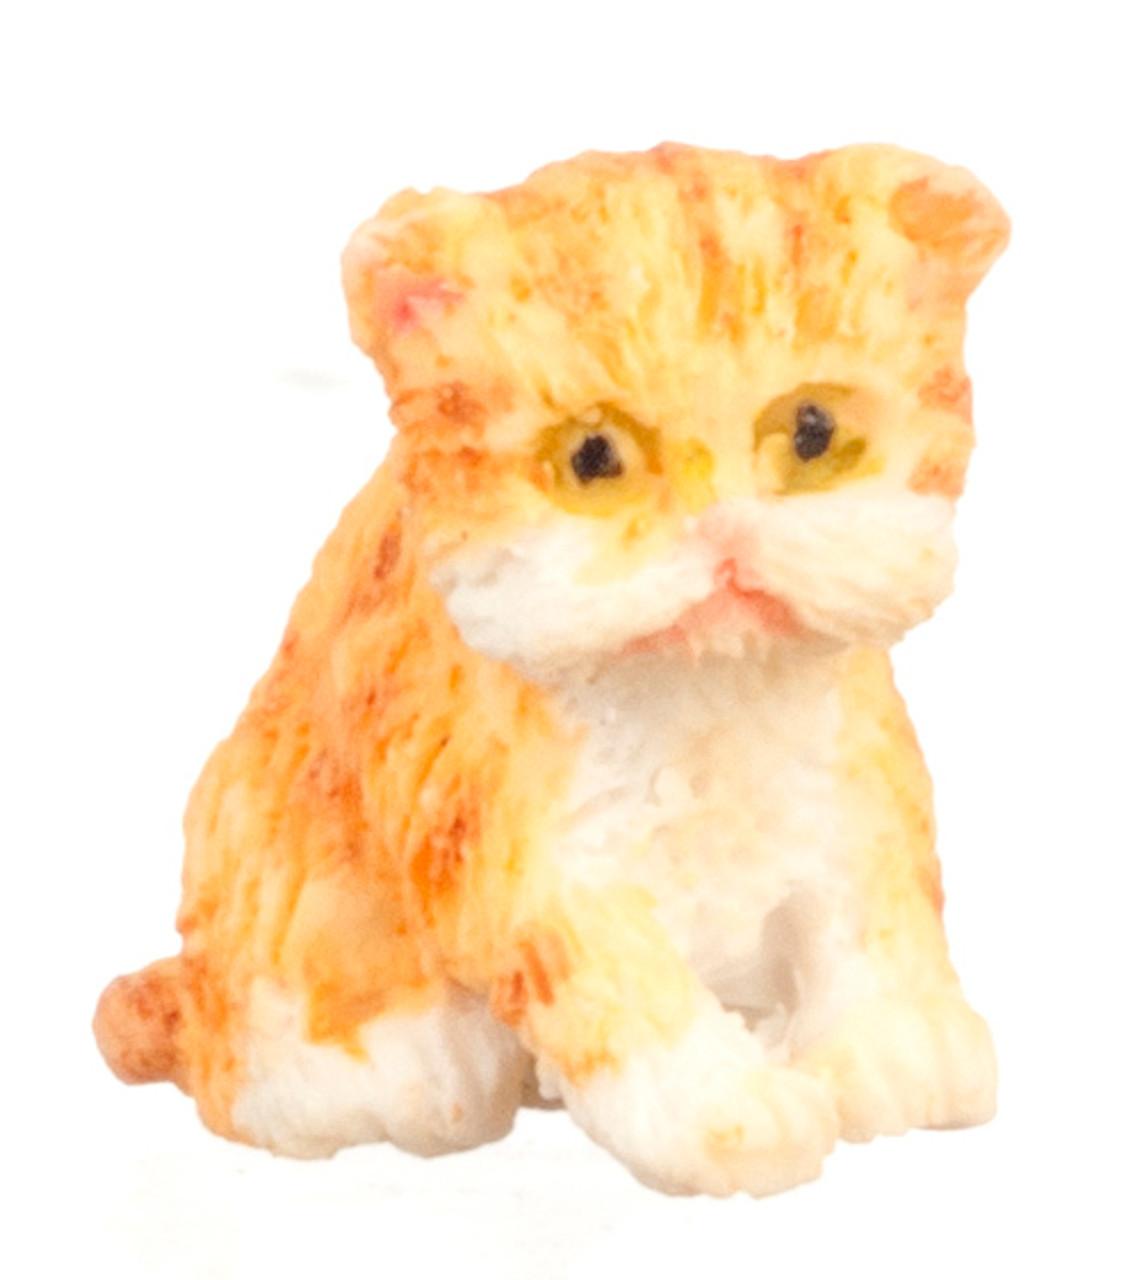 Dollhouse City - Dollhouse Miniatures Persian Kitten - Orange